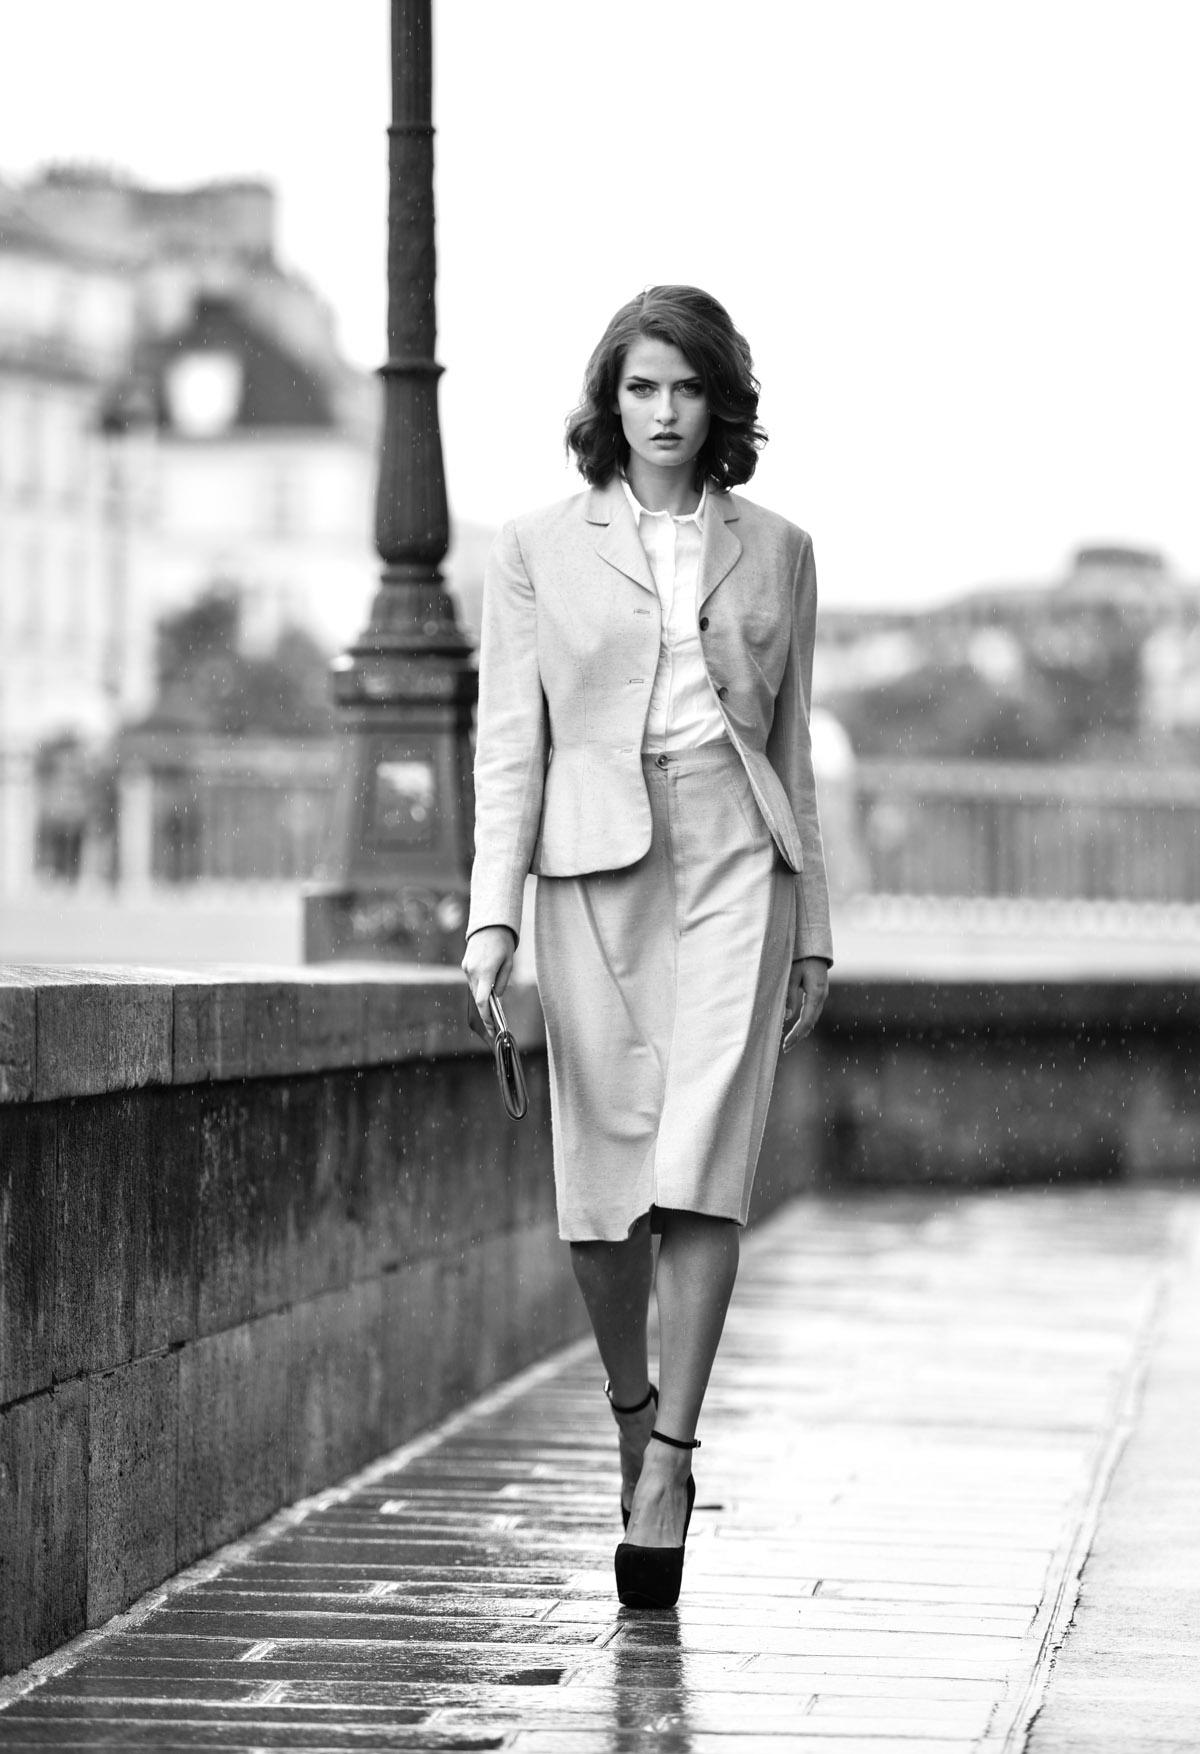 Paris Female couple Editorial - nouvelle Romance homage by Peter Mueller Photography 19